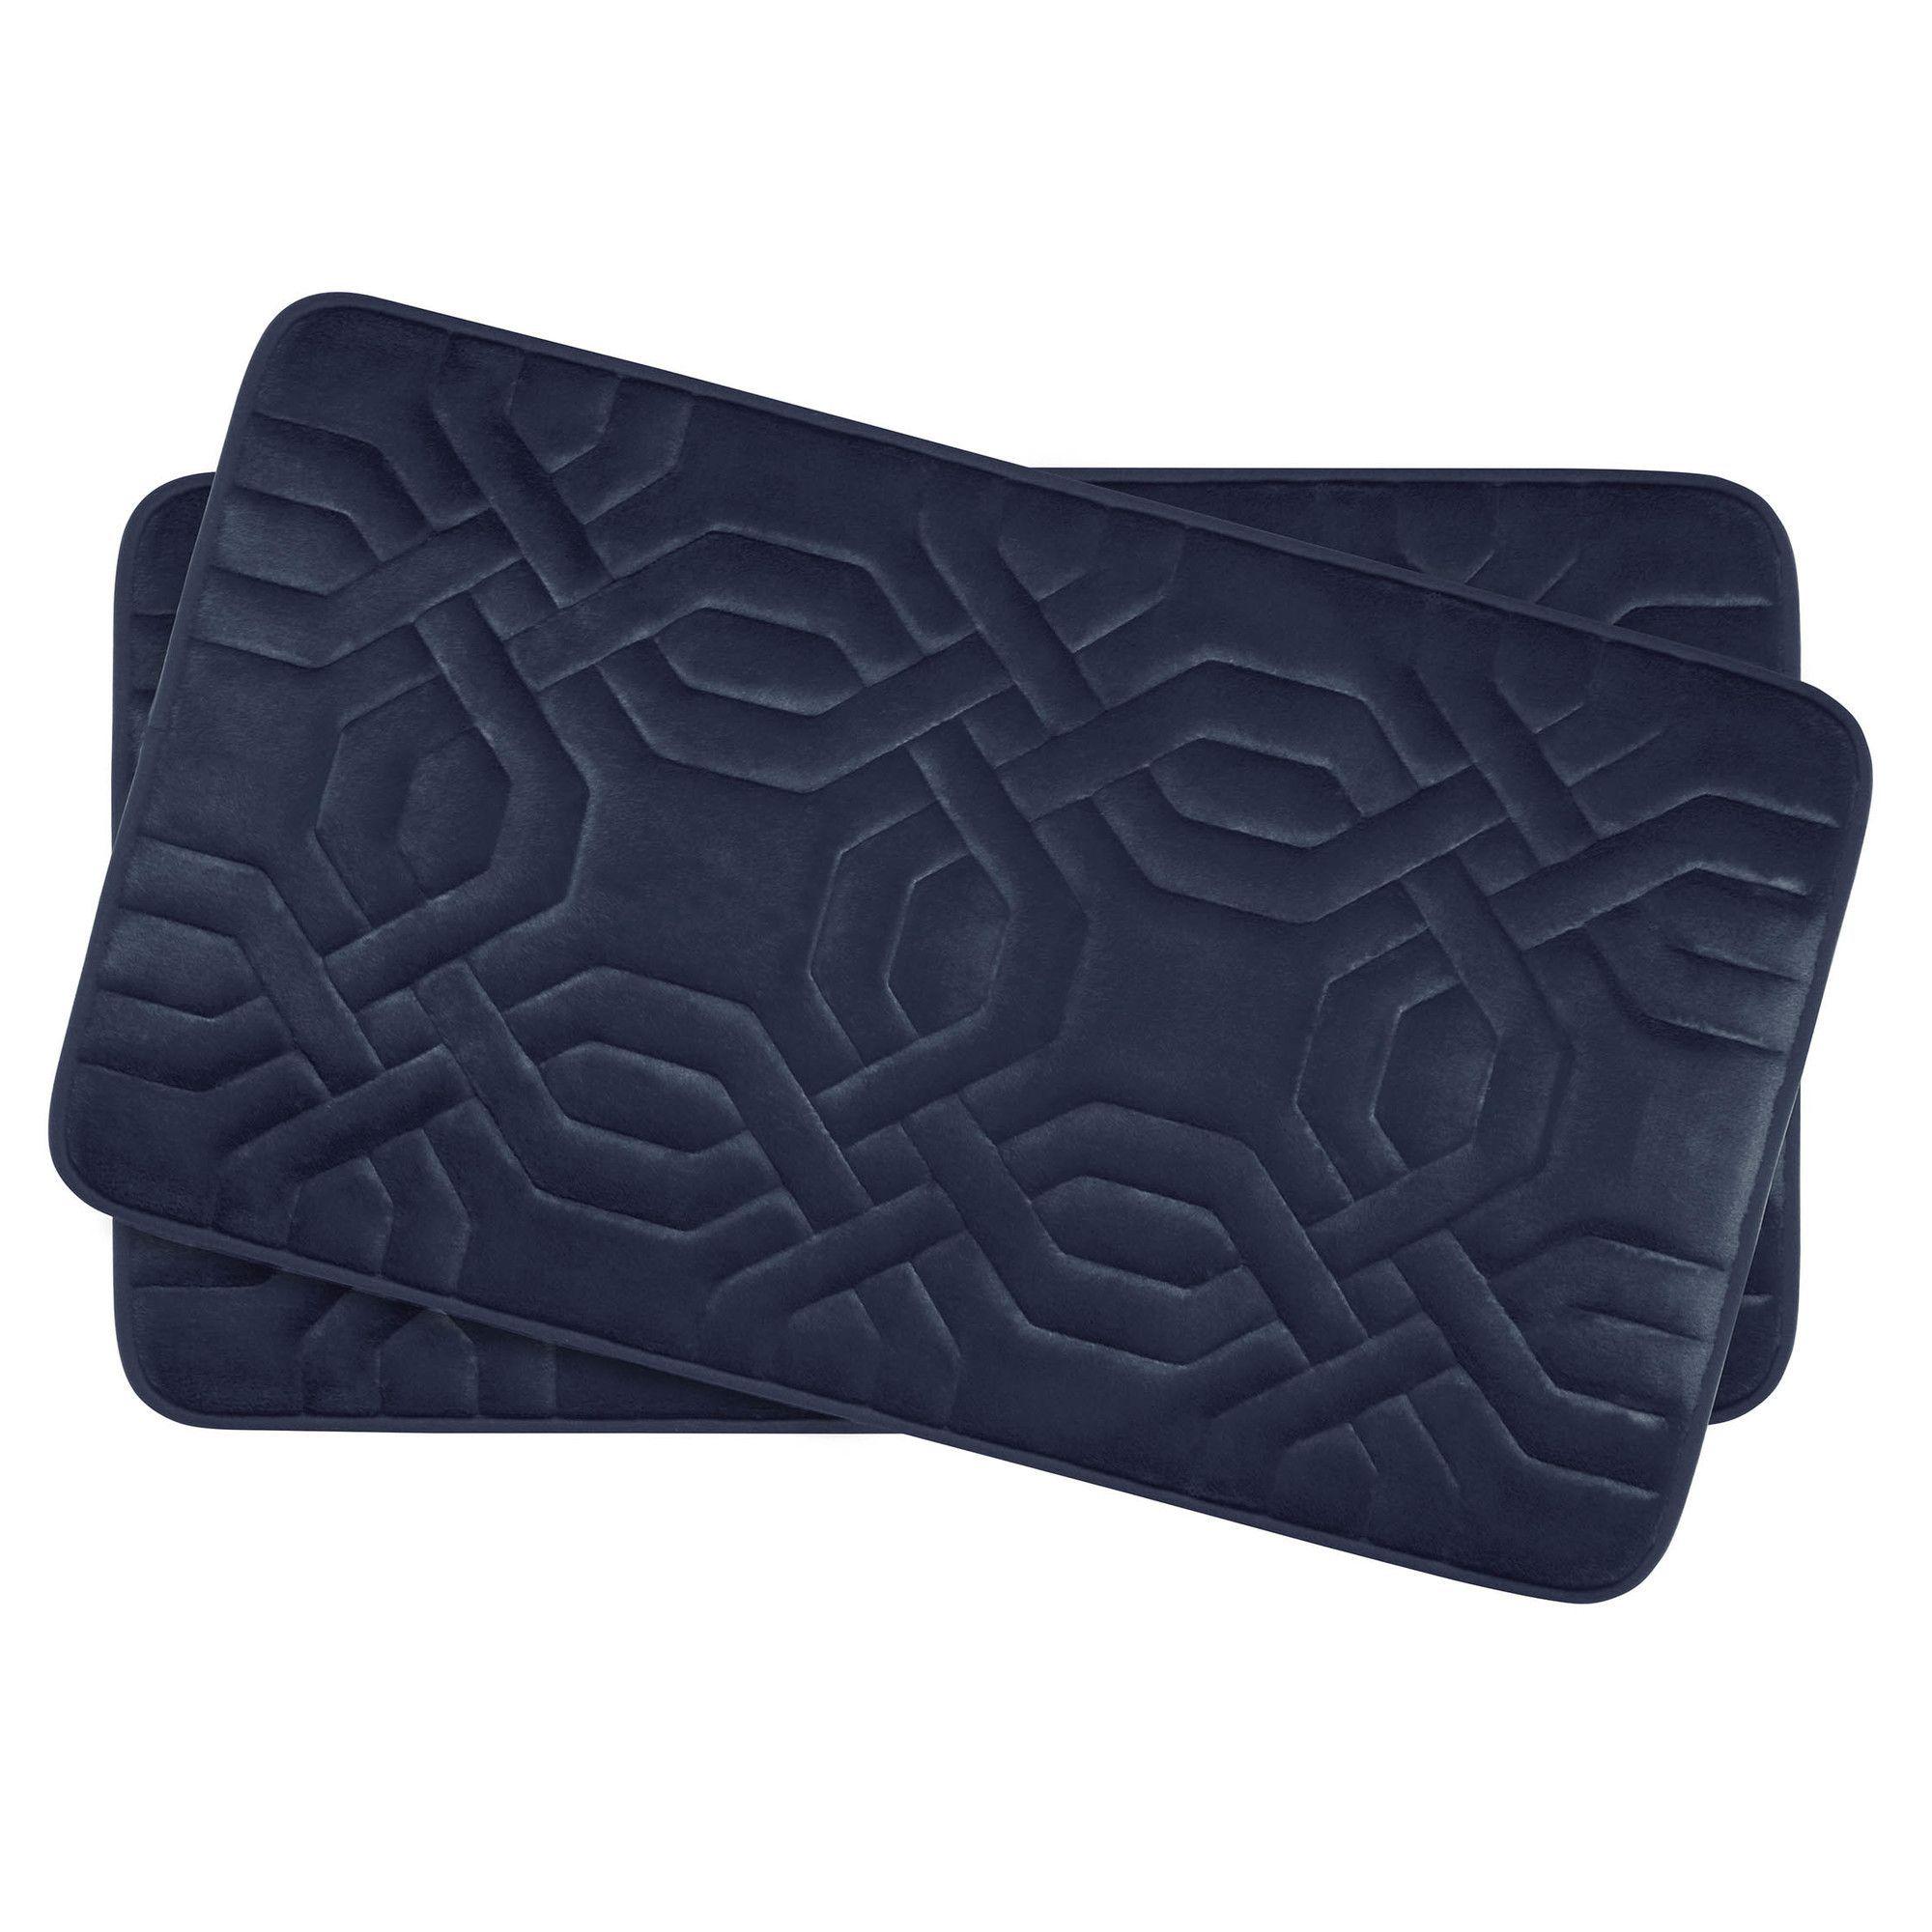 Chain Ring Small 2 Piece Premium Micro Plush Memory Foam Bath Mat Set